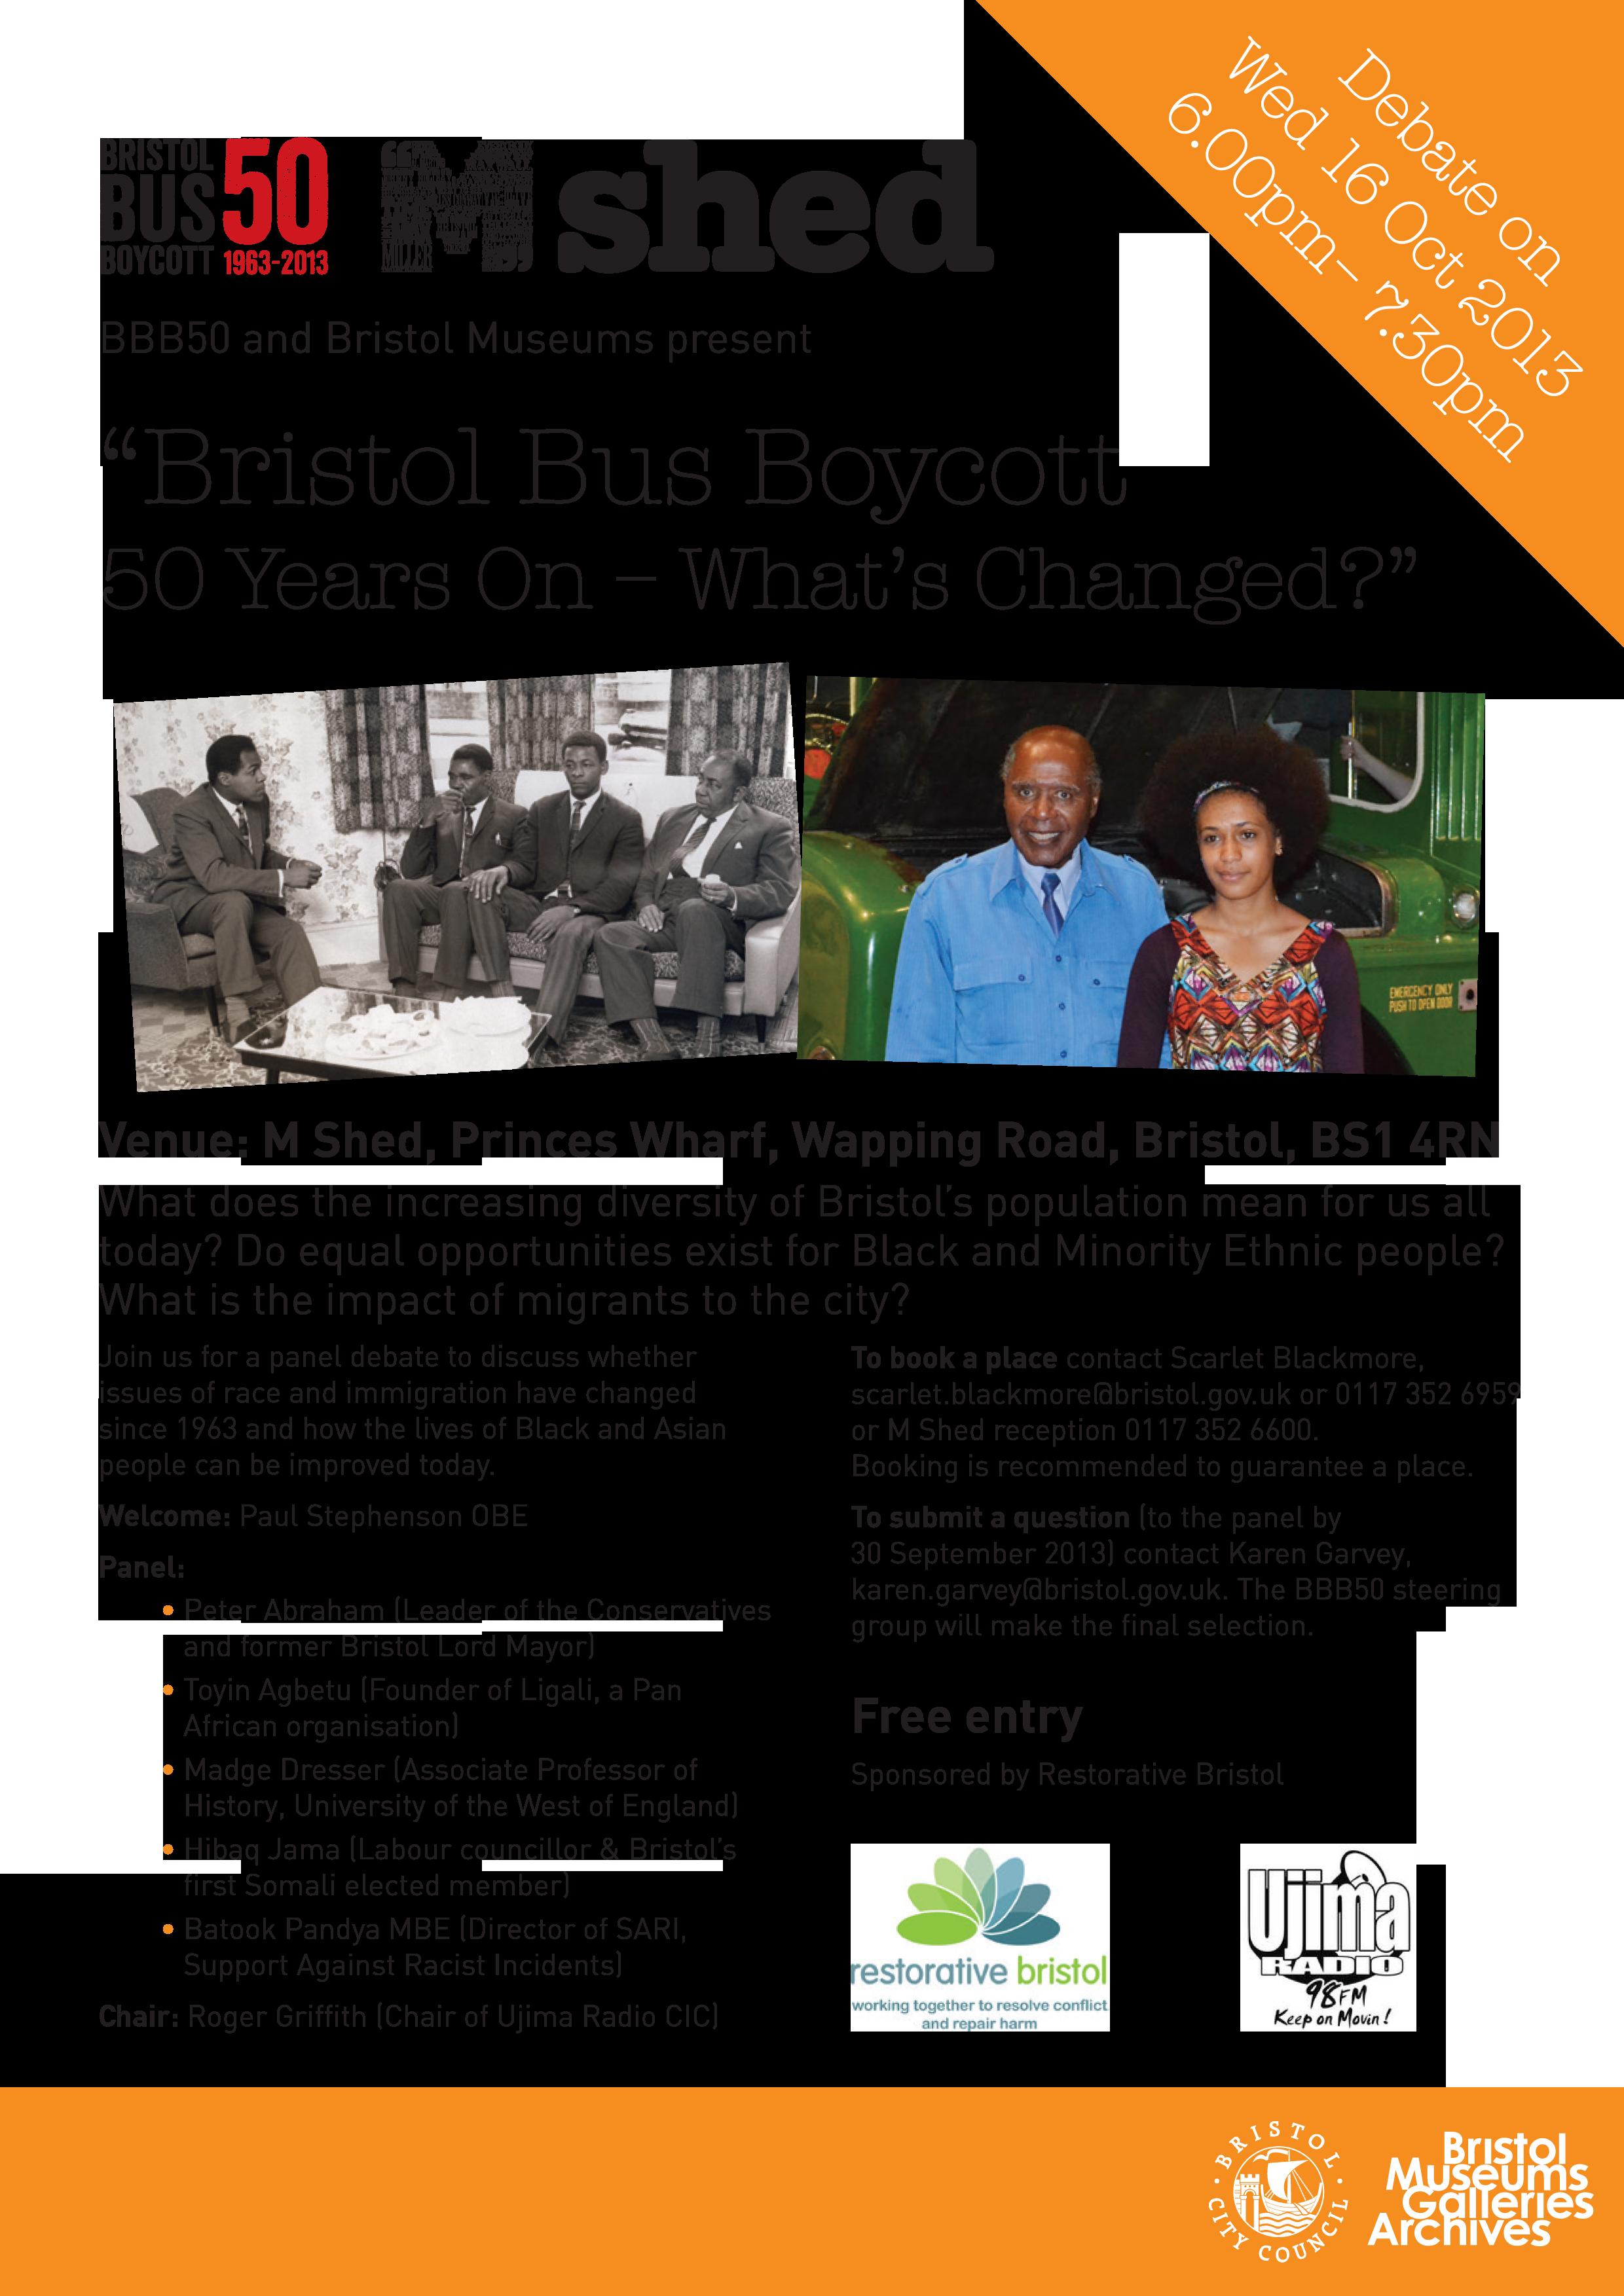 BD4551 Bristol Bus Boycott flyer A4